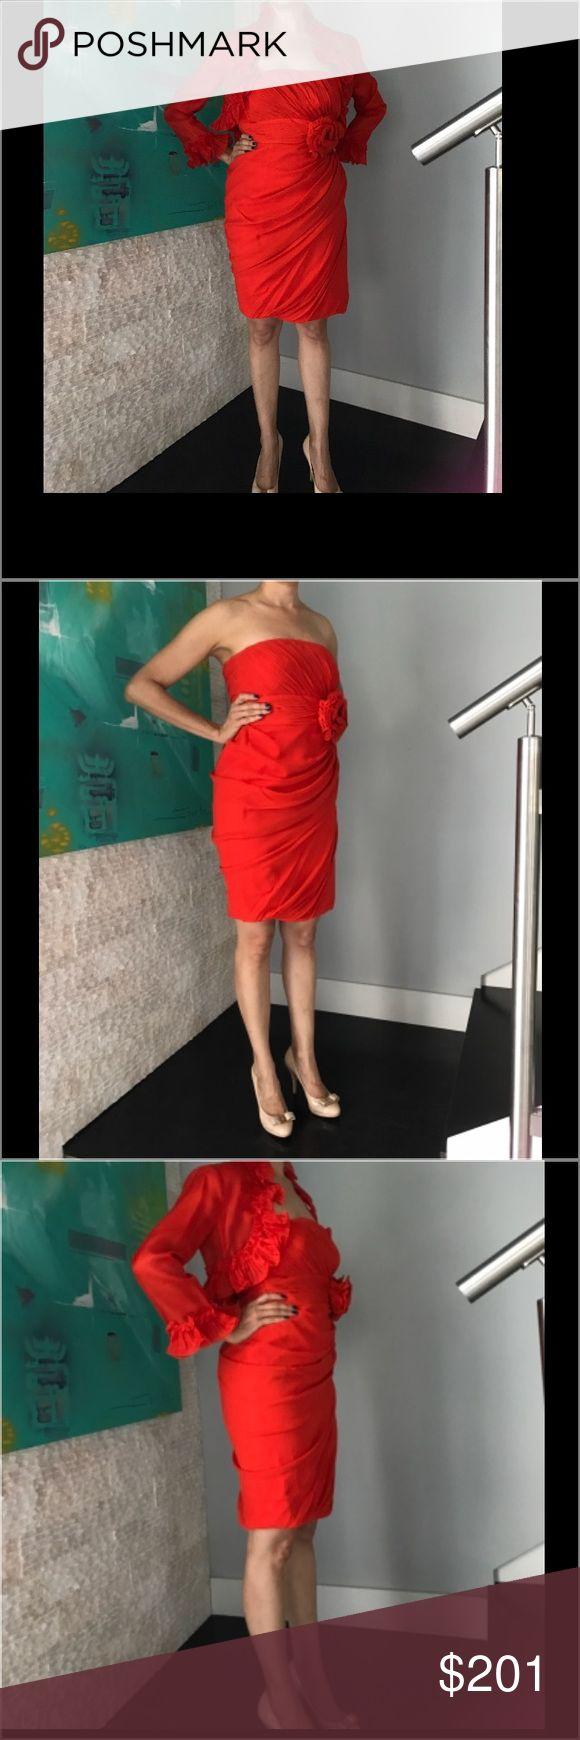 STYLE OBSESSION 👠👢👛Valentino couture silk dress All silk rich valentino red. Bolero and dress set. Size 42 Valentino Dresses Strapless